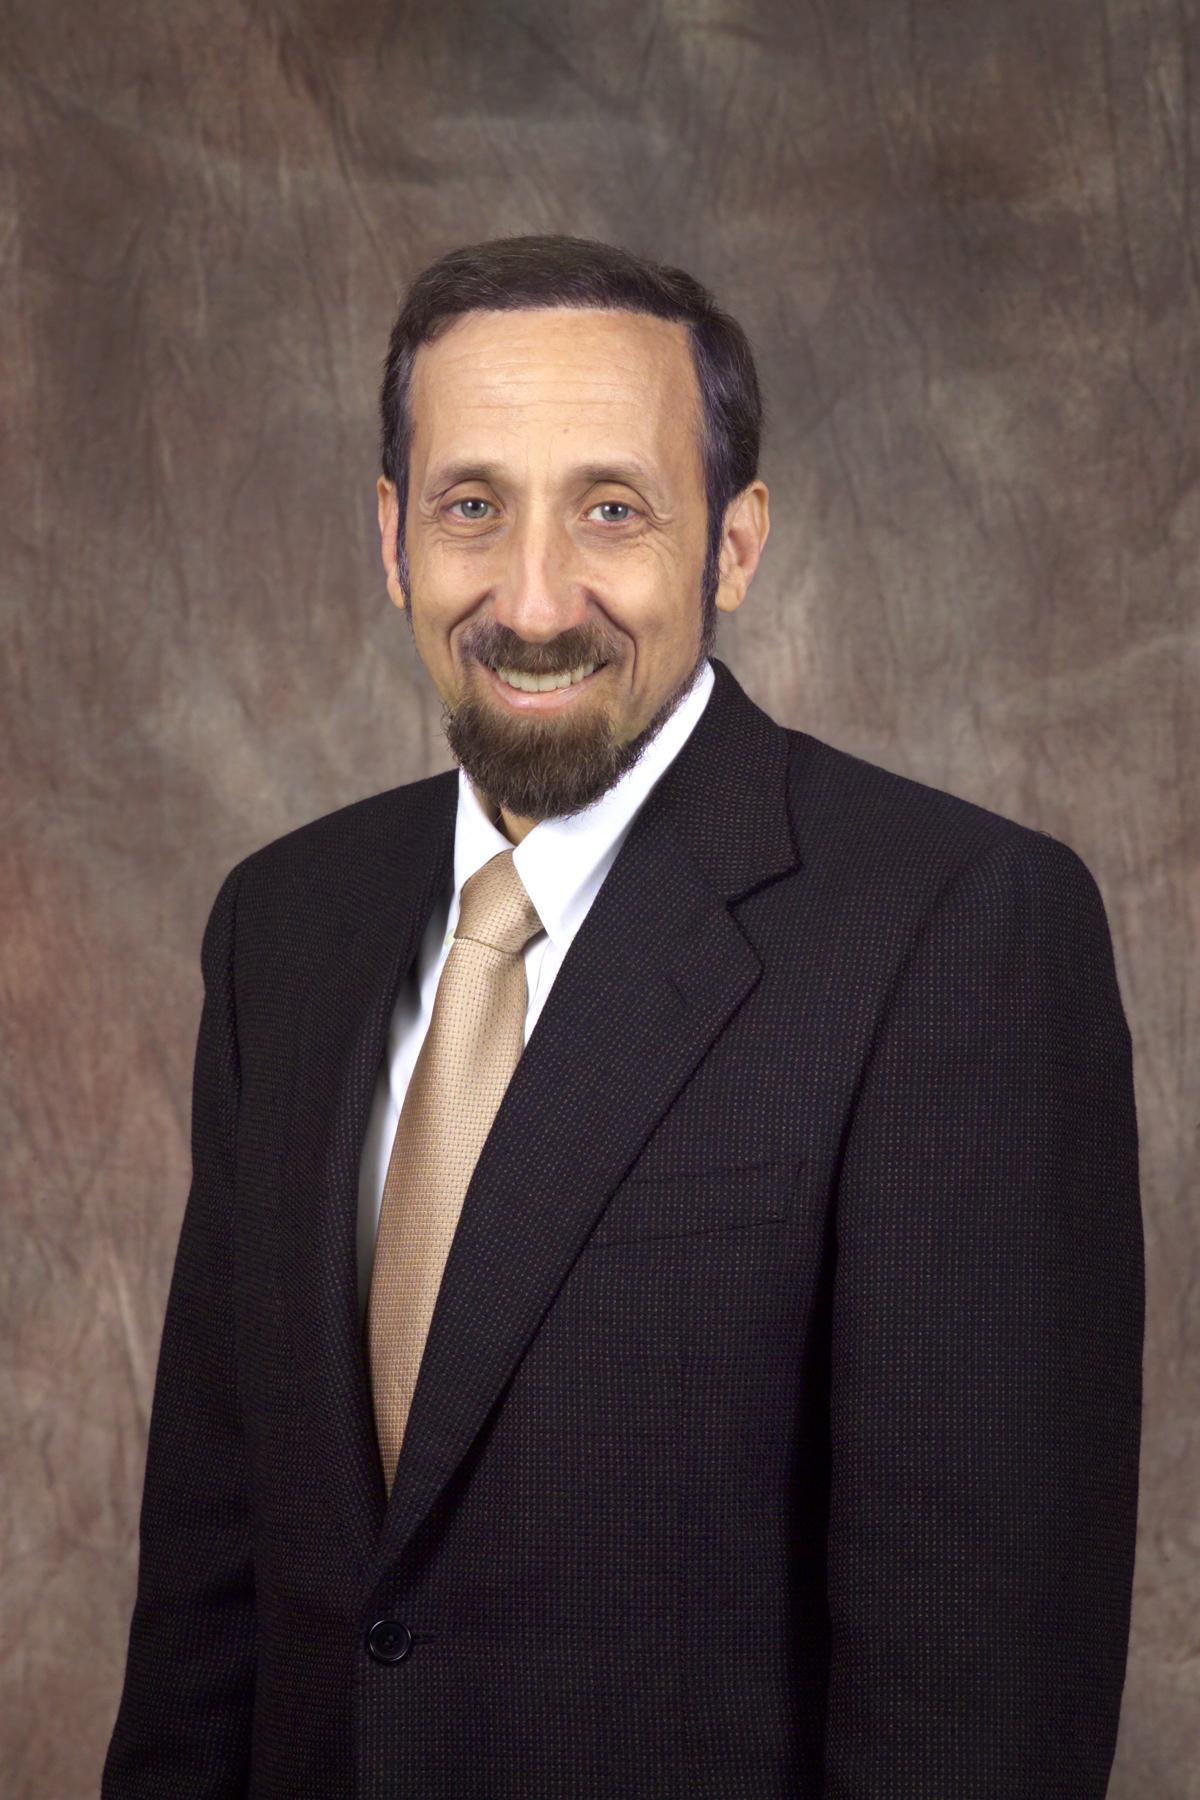 Bobby Rosenthal